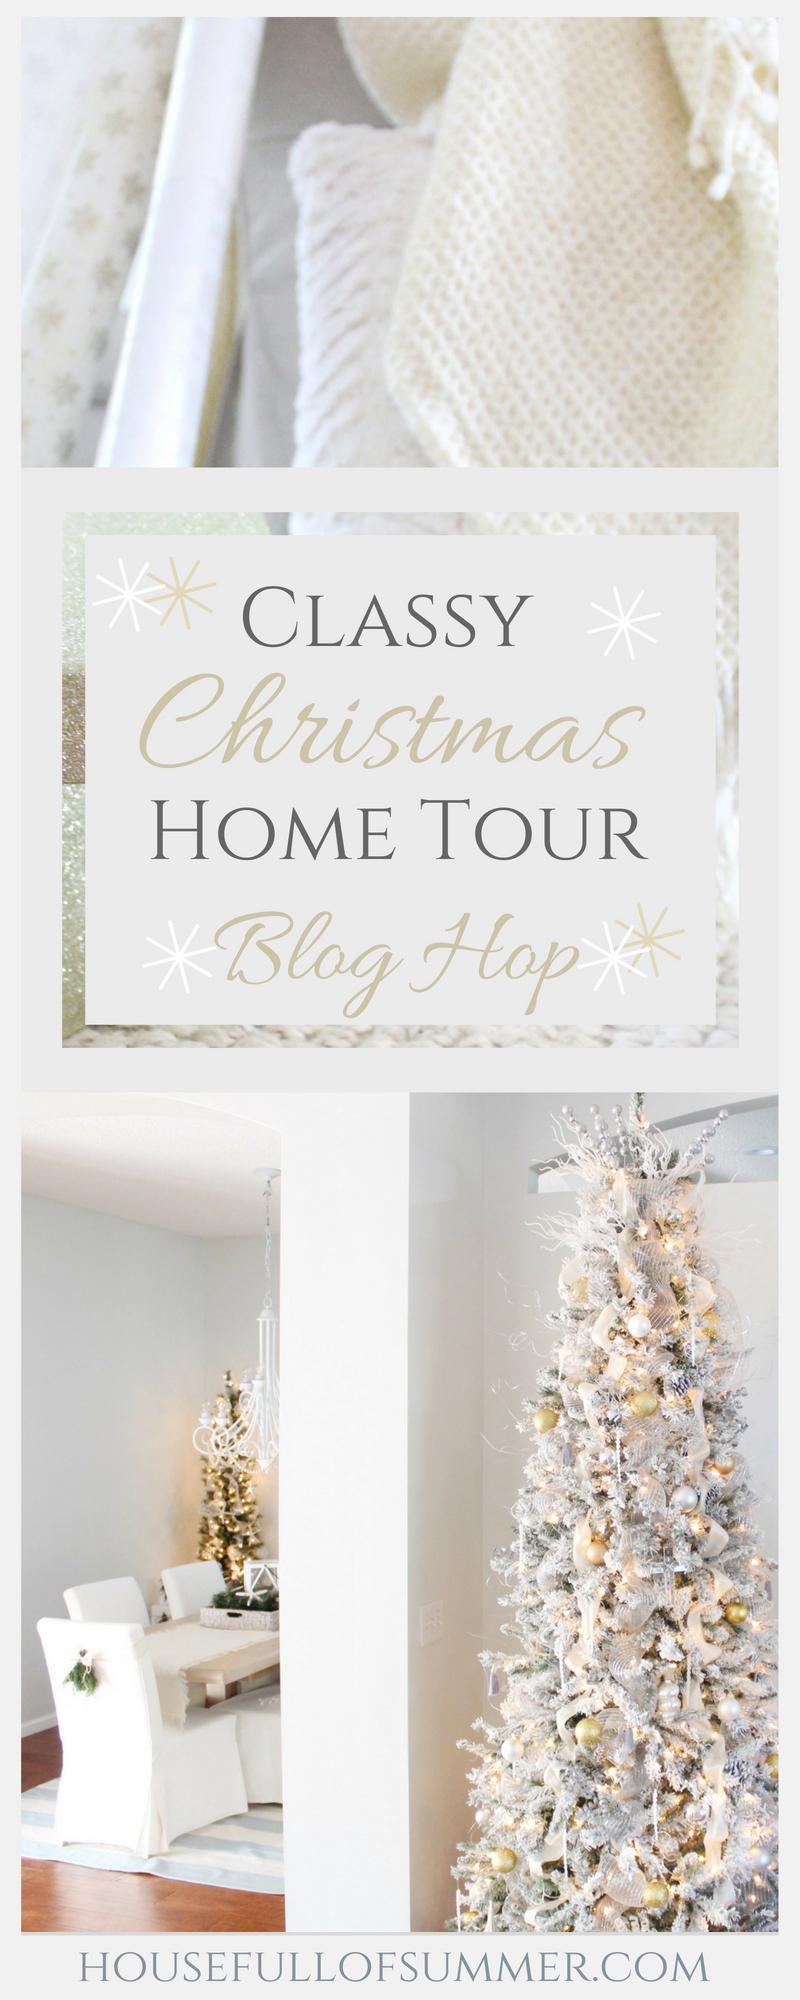 Christmas Home Tour | House Full of Summer blog hop - Cheerful Christmas Home Tour coastal christmas neutral christmas decor, holiday home tour, florida christmas style, beachy decor, foyer decor, diy Christmas #housefullofsummer #christmasdecor #coastaldecor